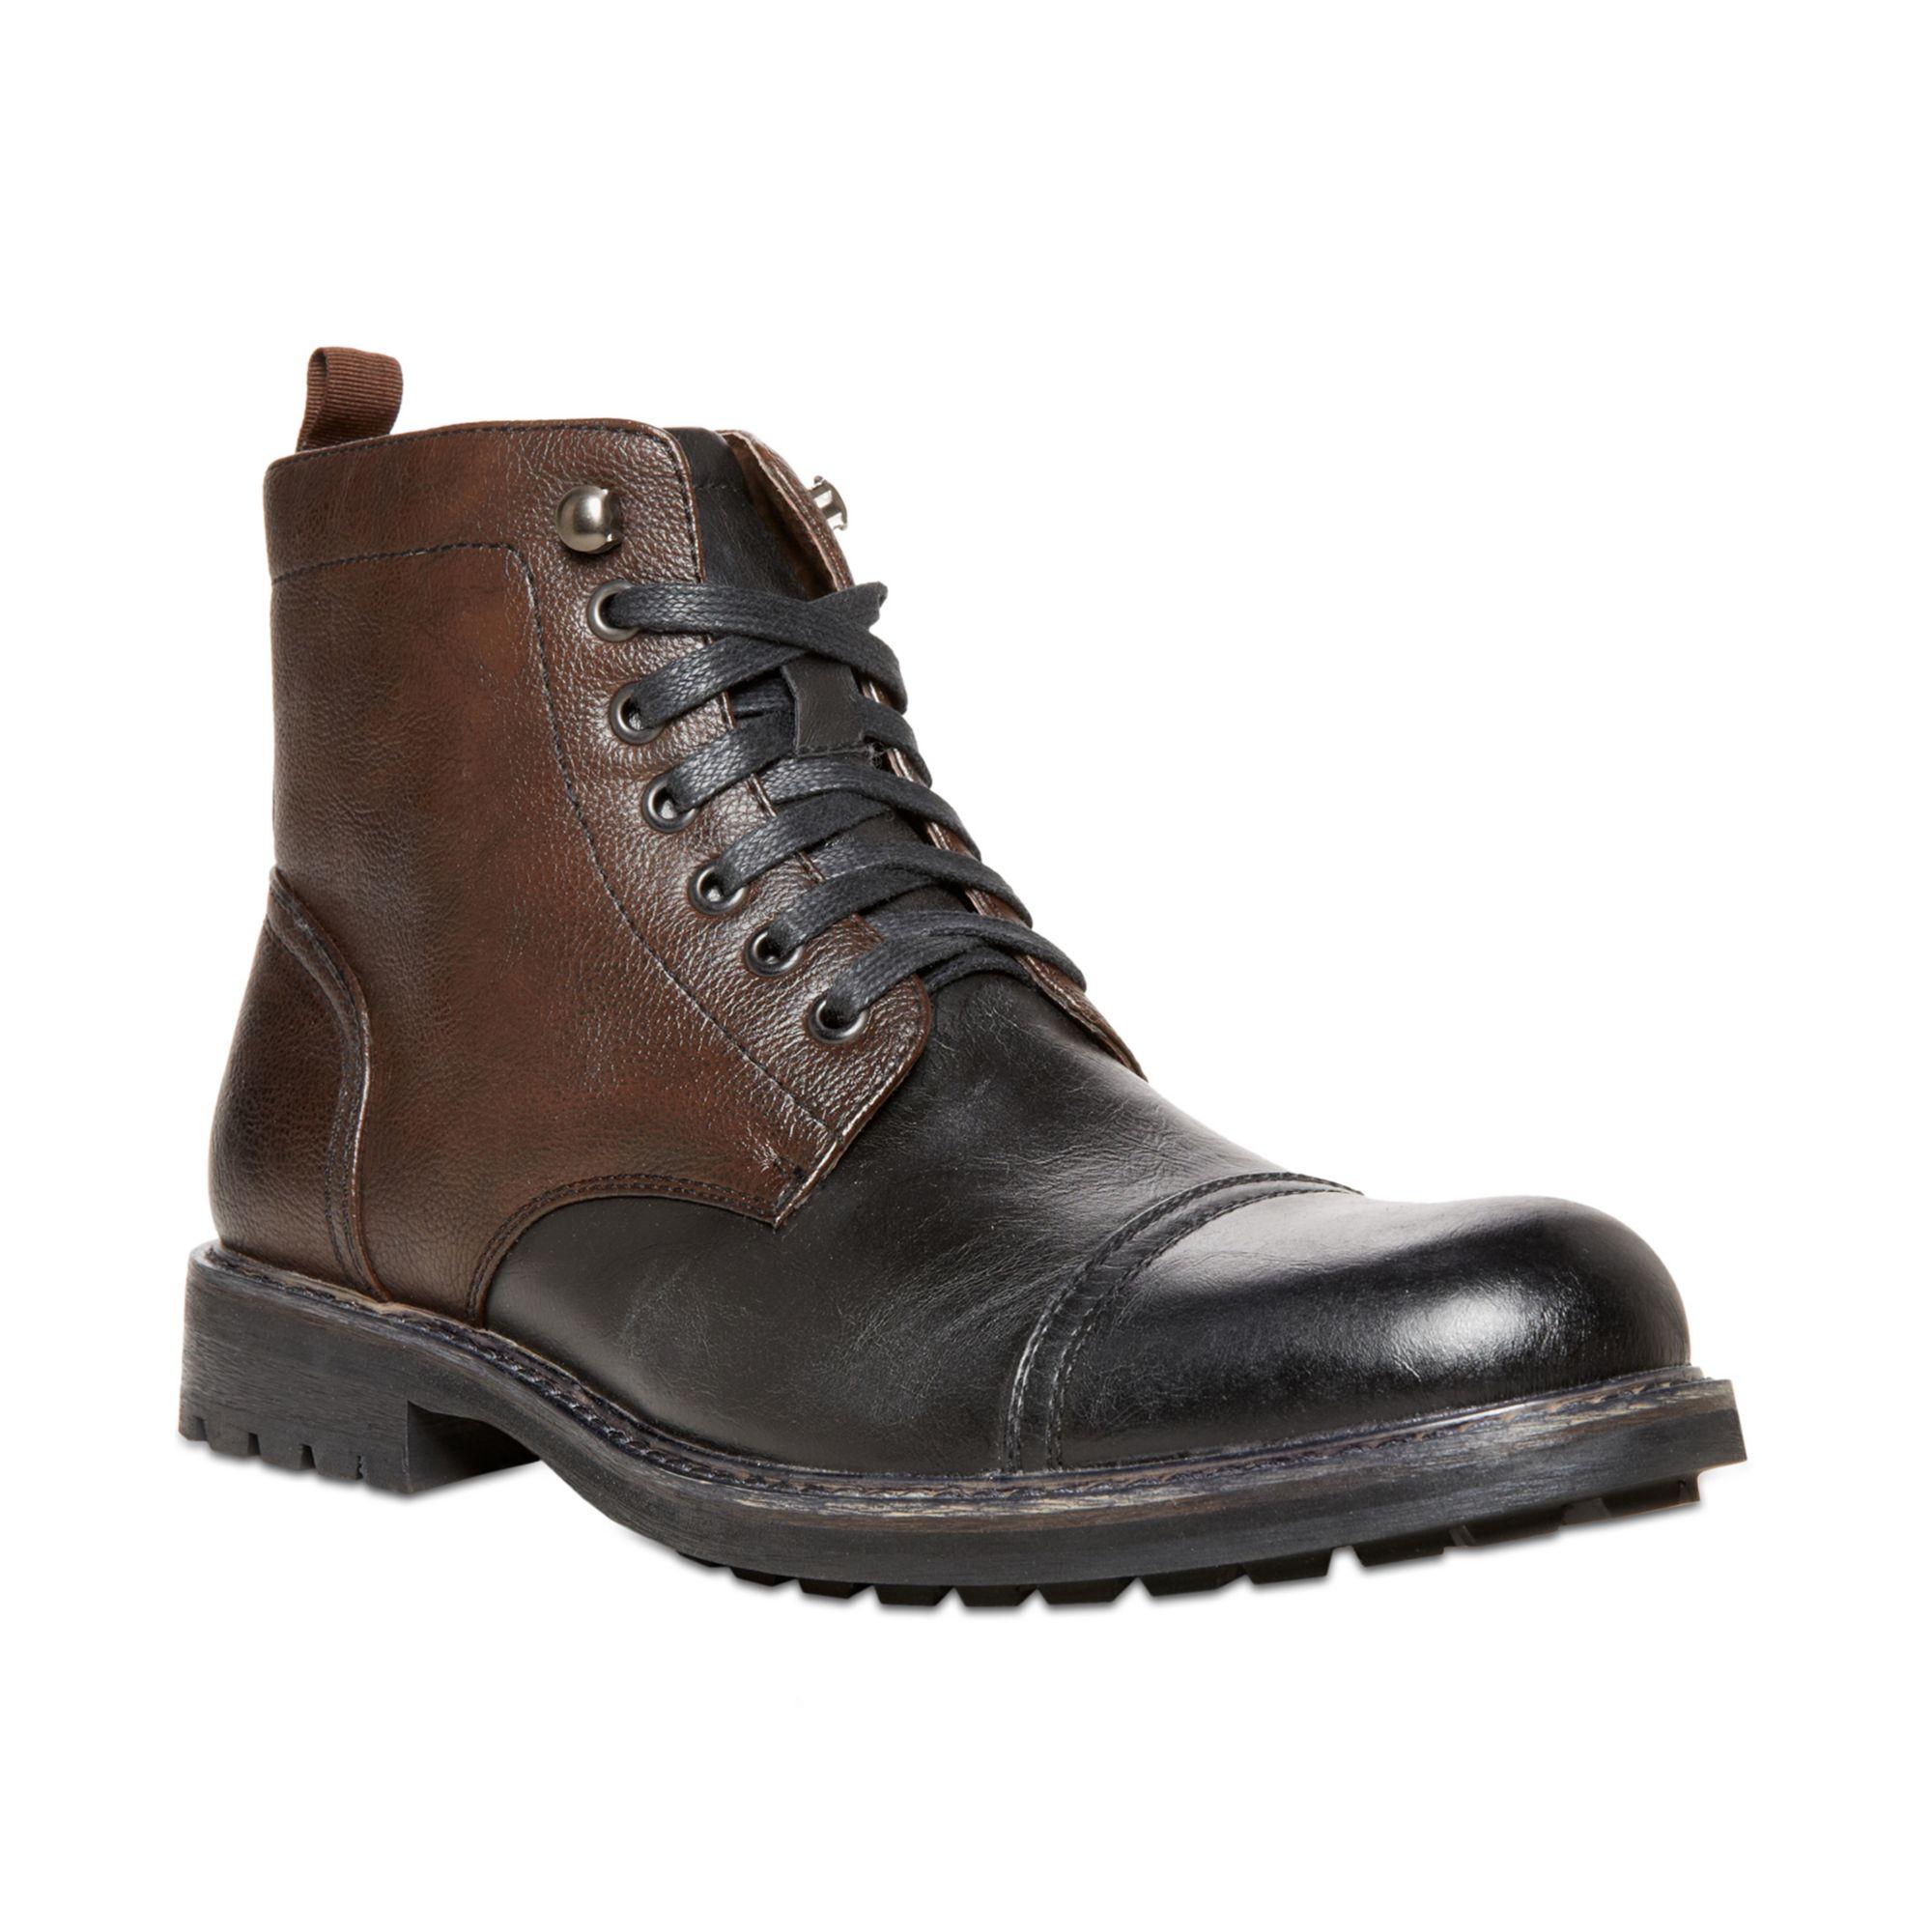 steve madden madden mens shoes ignite captoe boots in